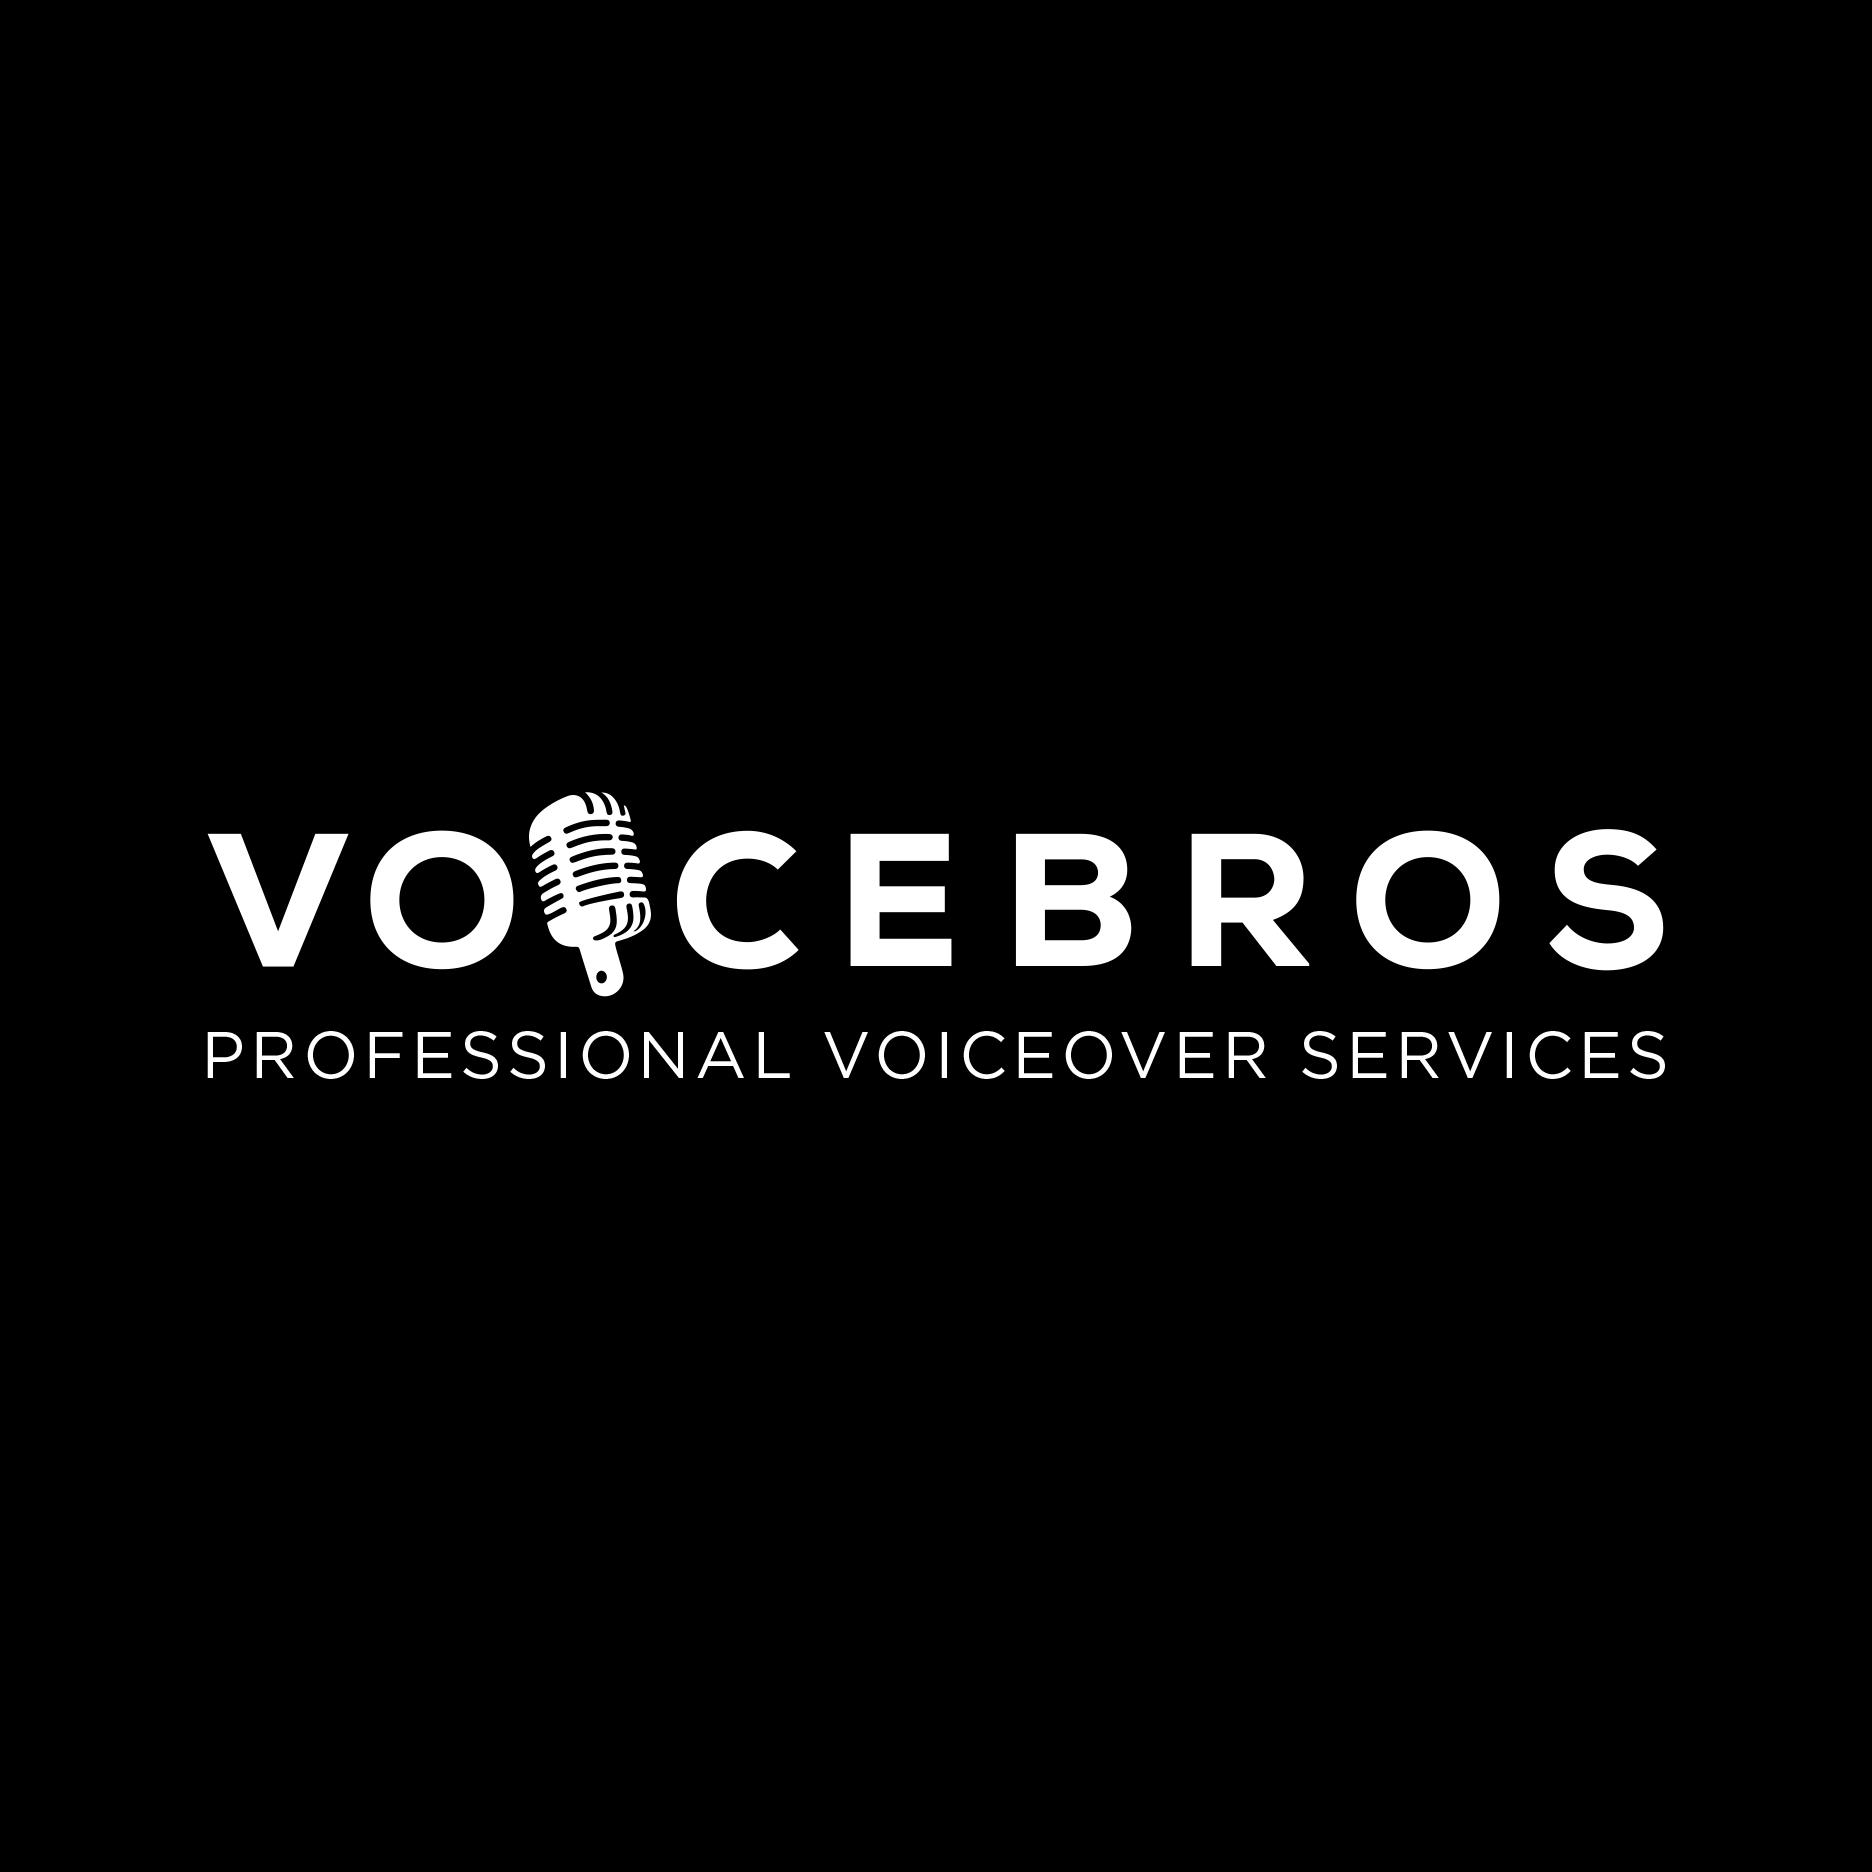 Juan Carlos is a voice over actor